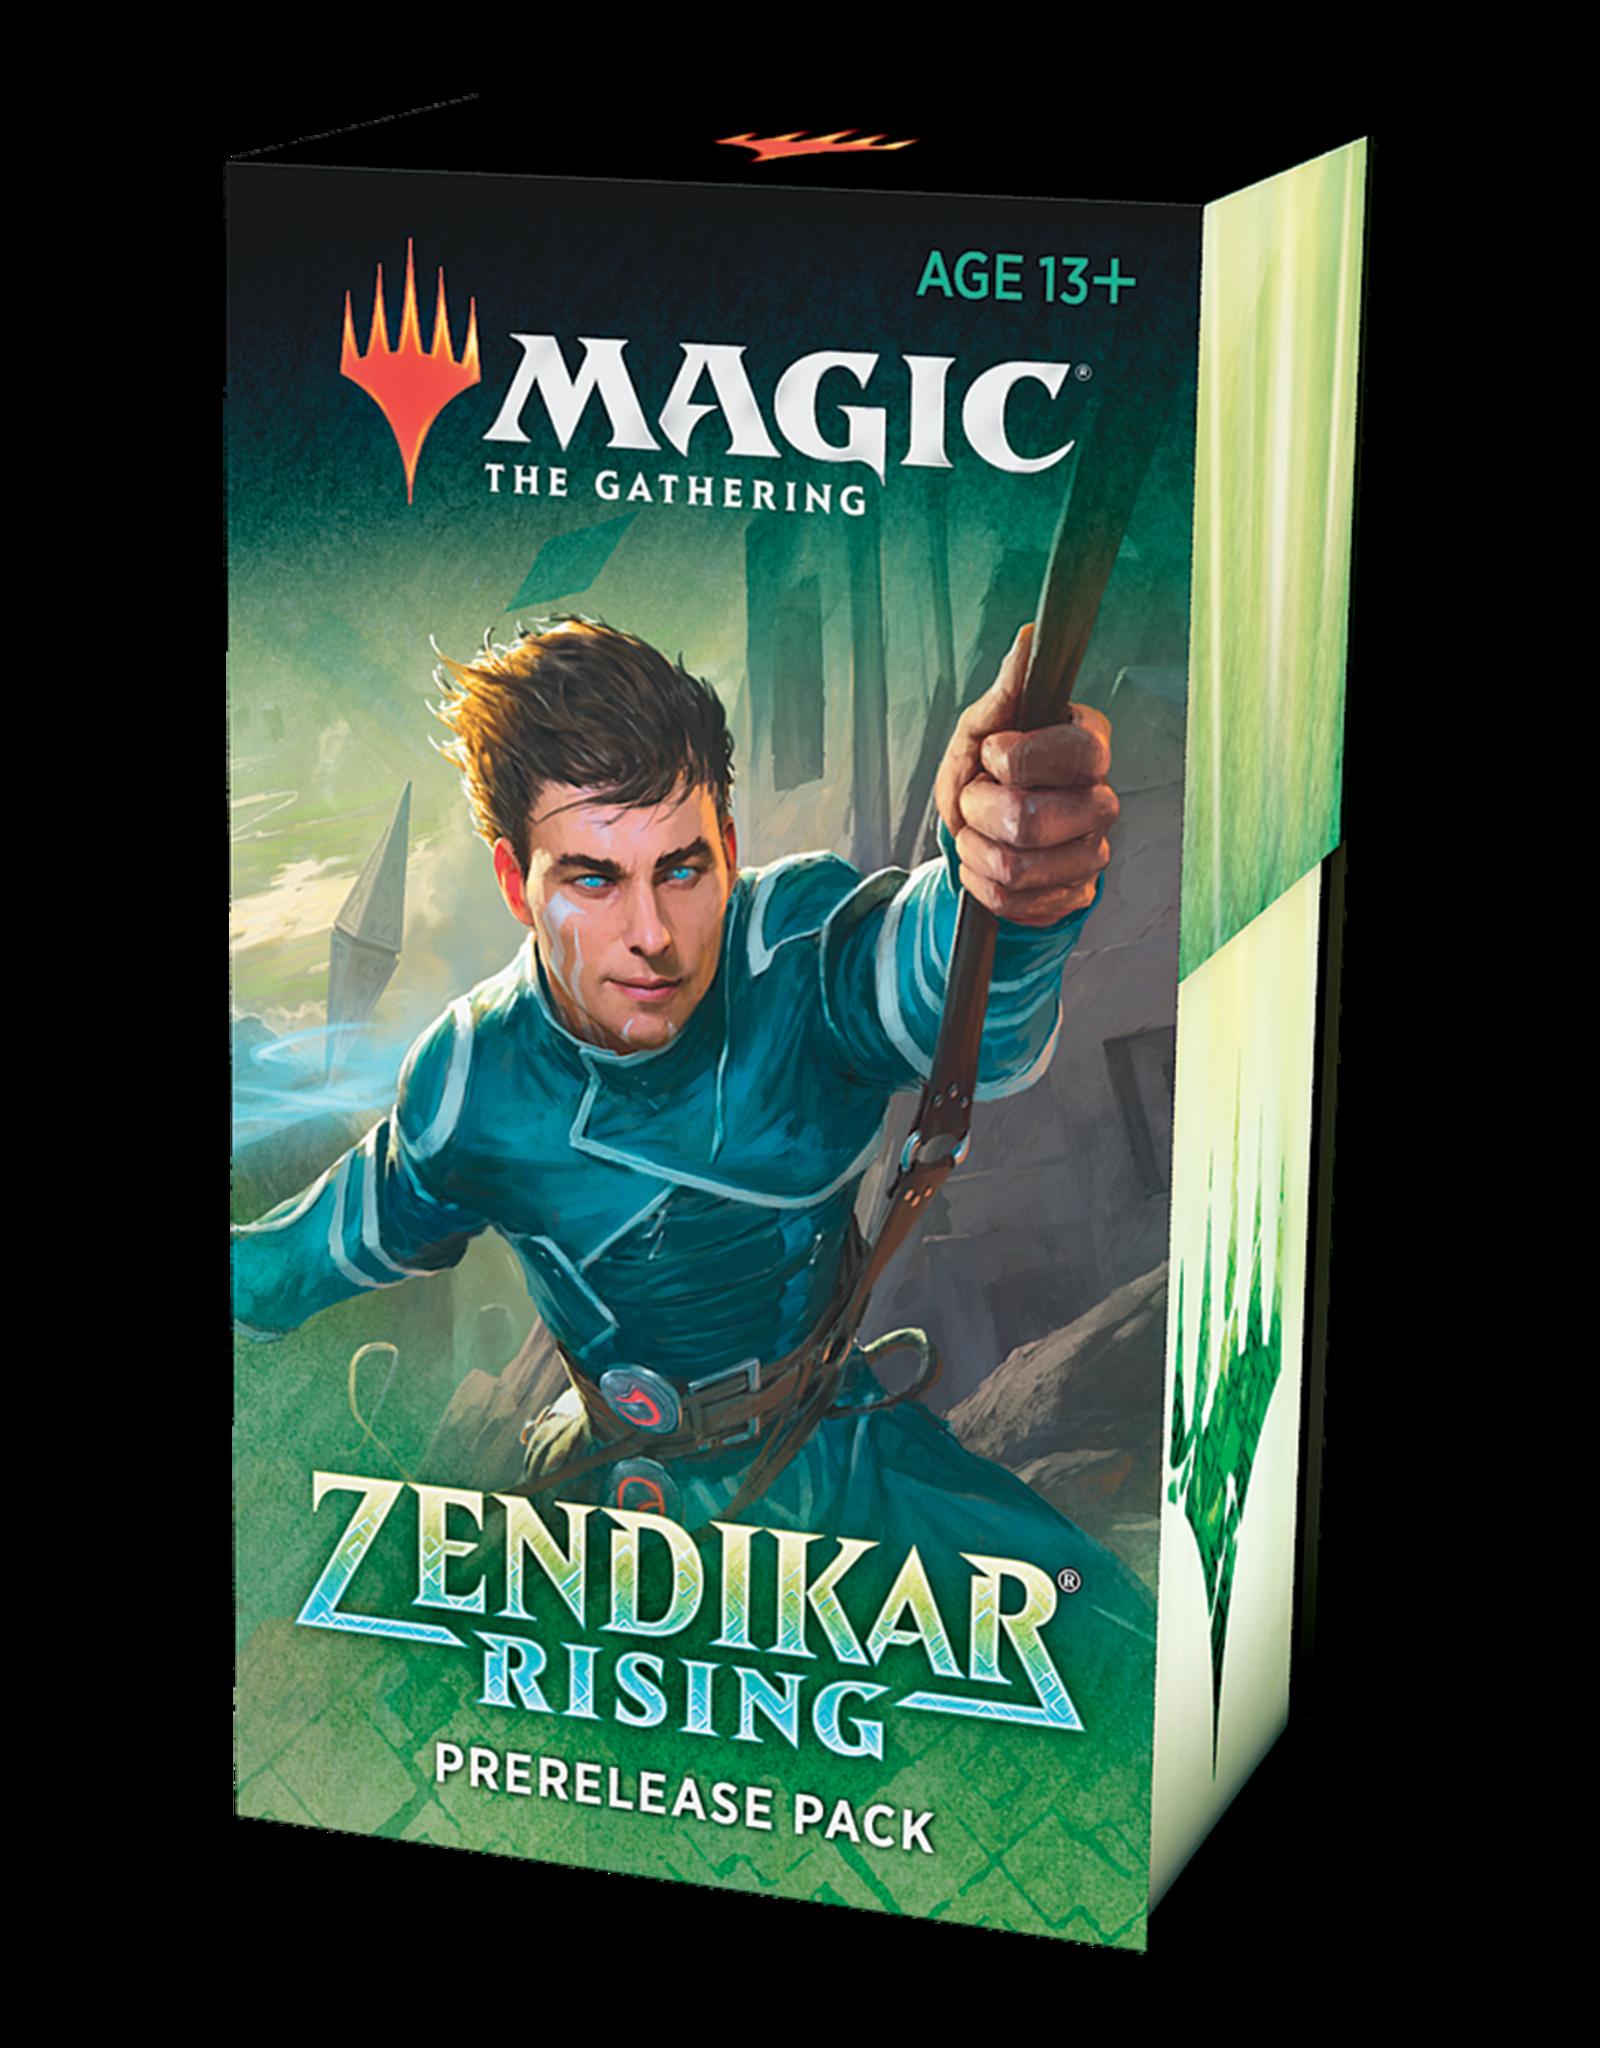 Magic: The Gathering Zendikar Rising Prerelease Pack